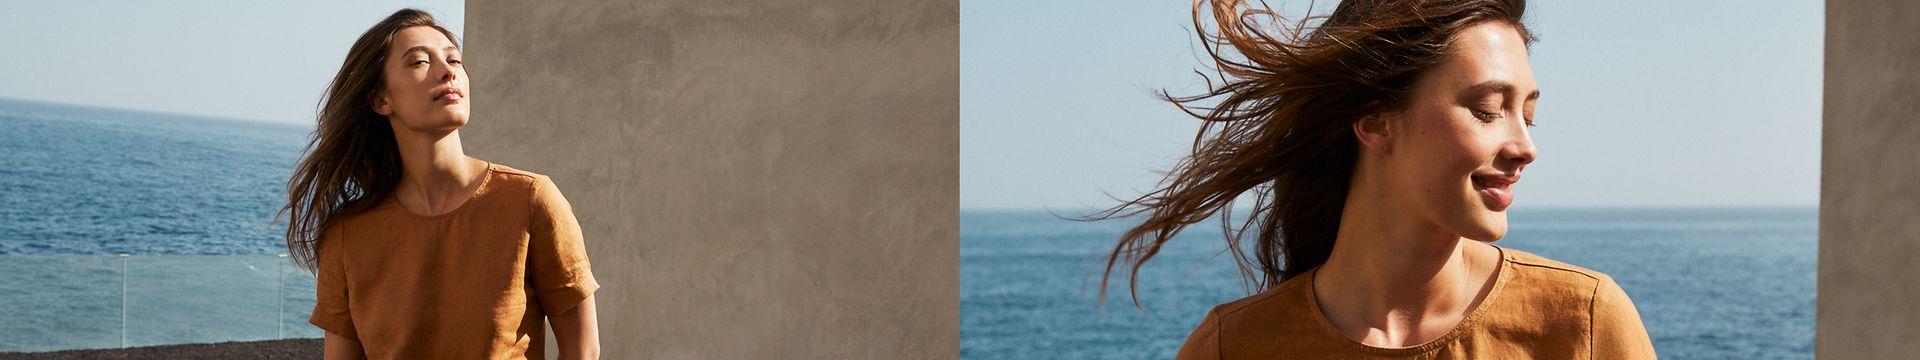 182020 - Mujer - Inspiración - tc banner - Coñac&Negro - IMG